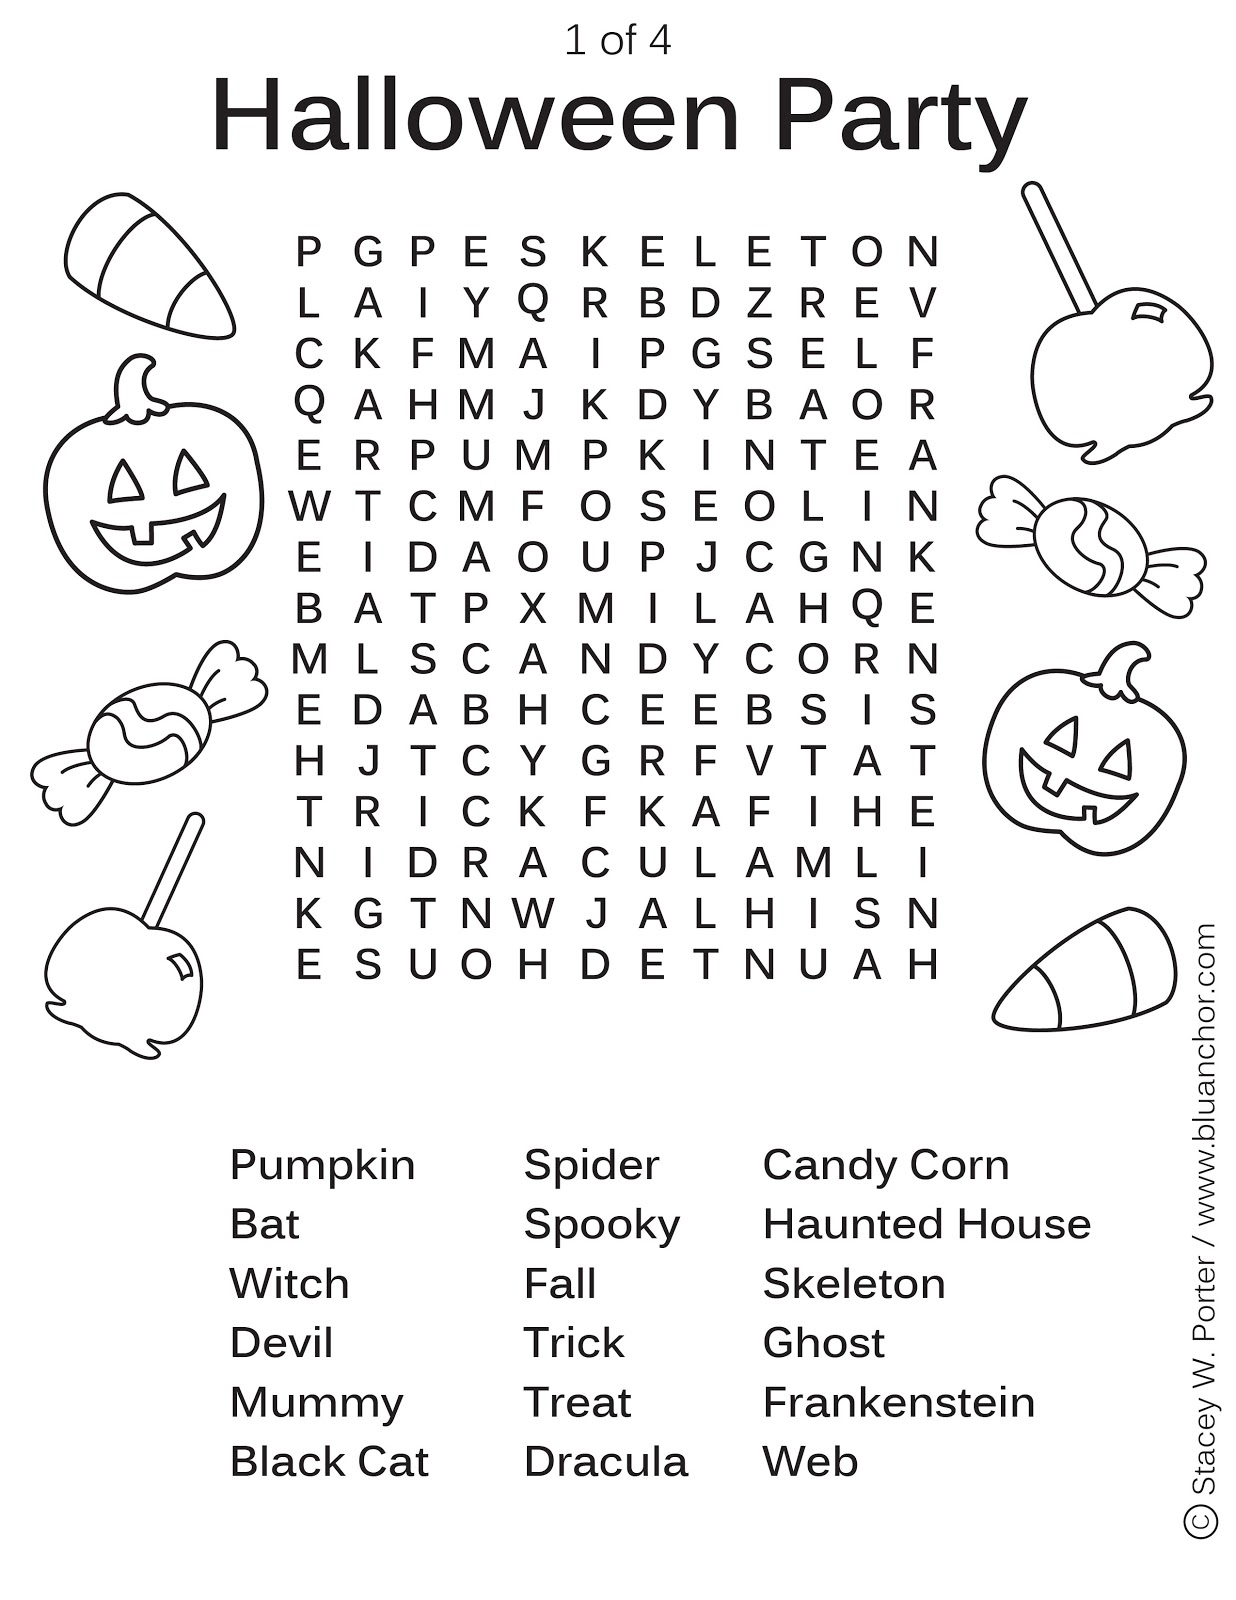 Blu Anchor Halloween Party Word